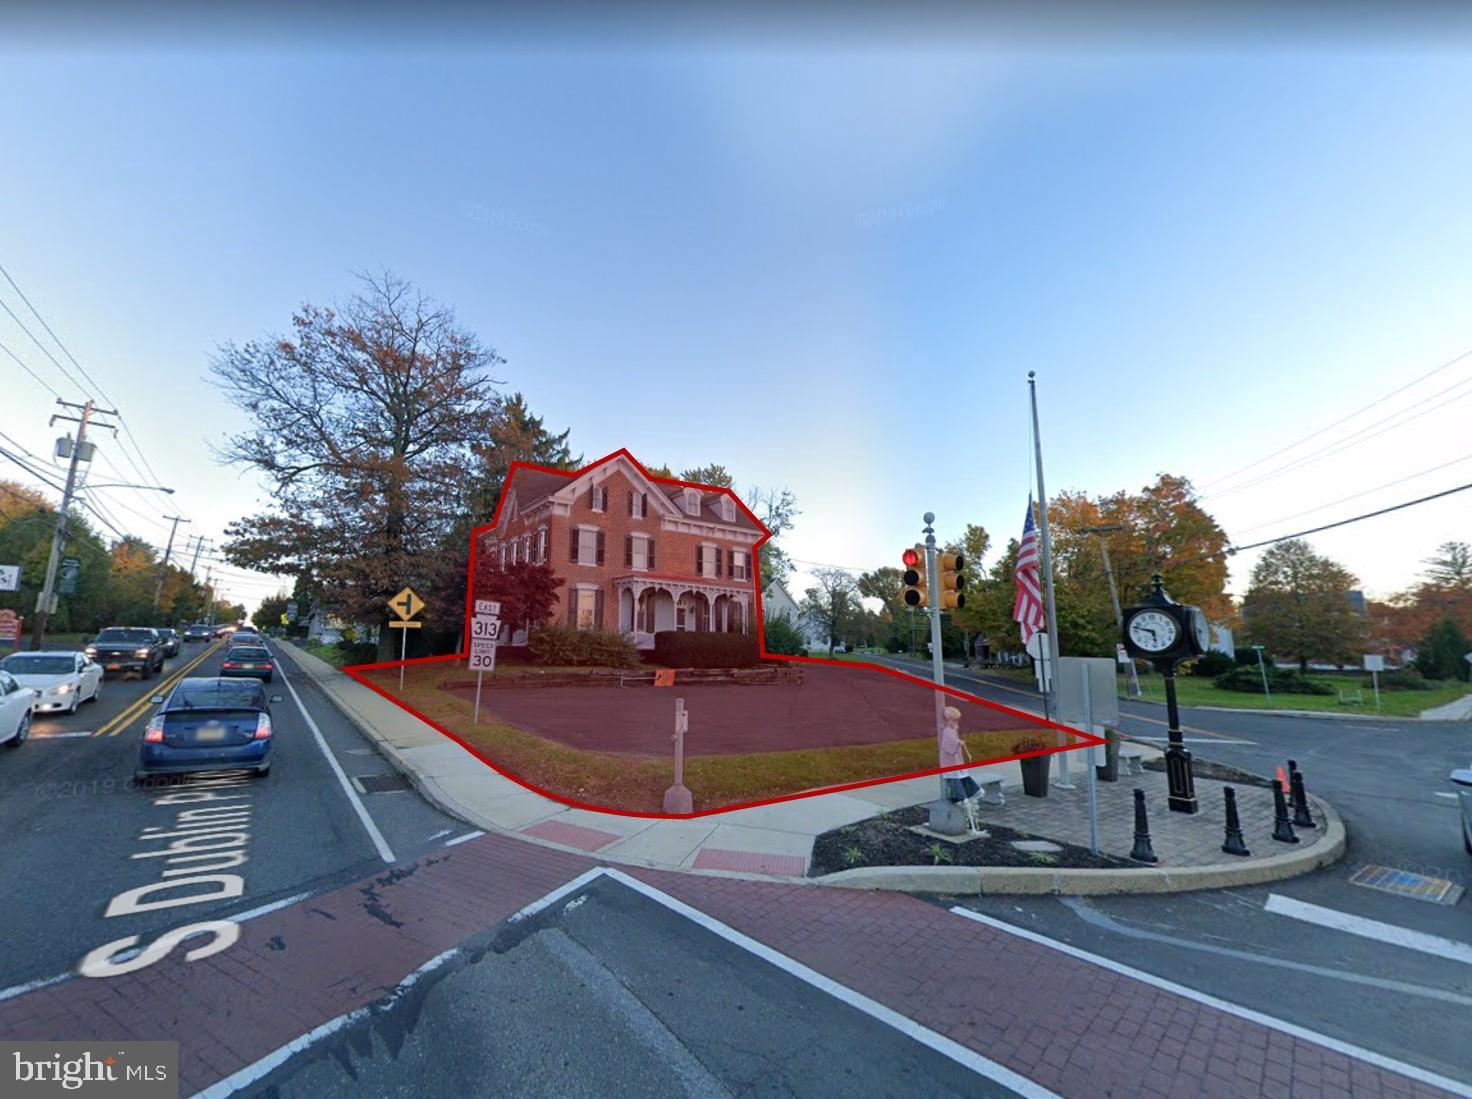 106 S MAIN STREET, DUBLIN, PA 18917